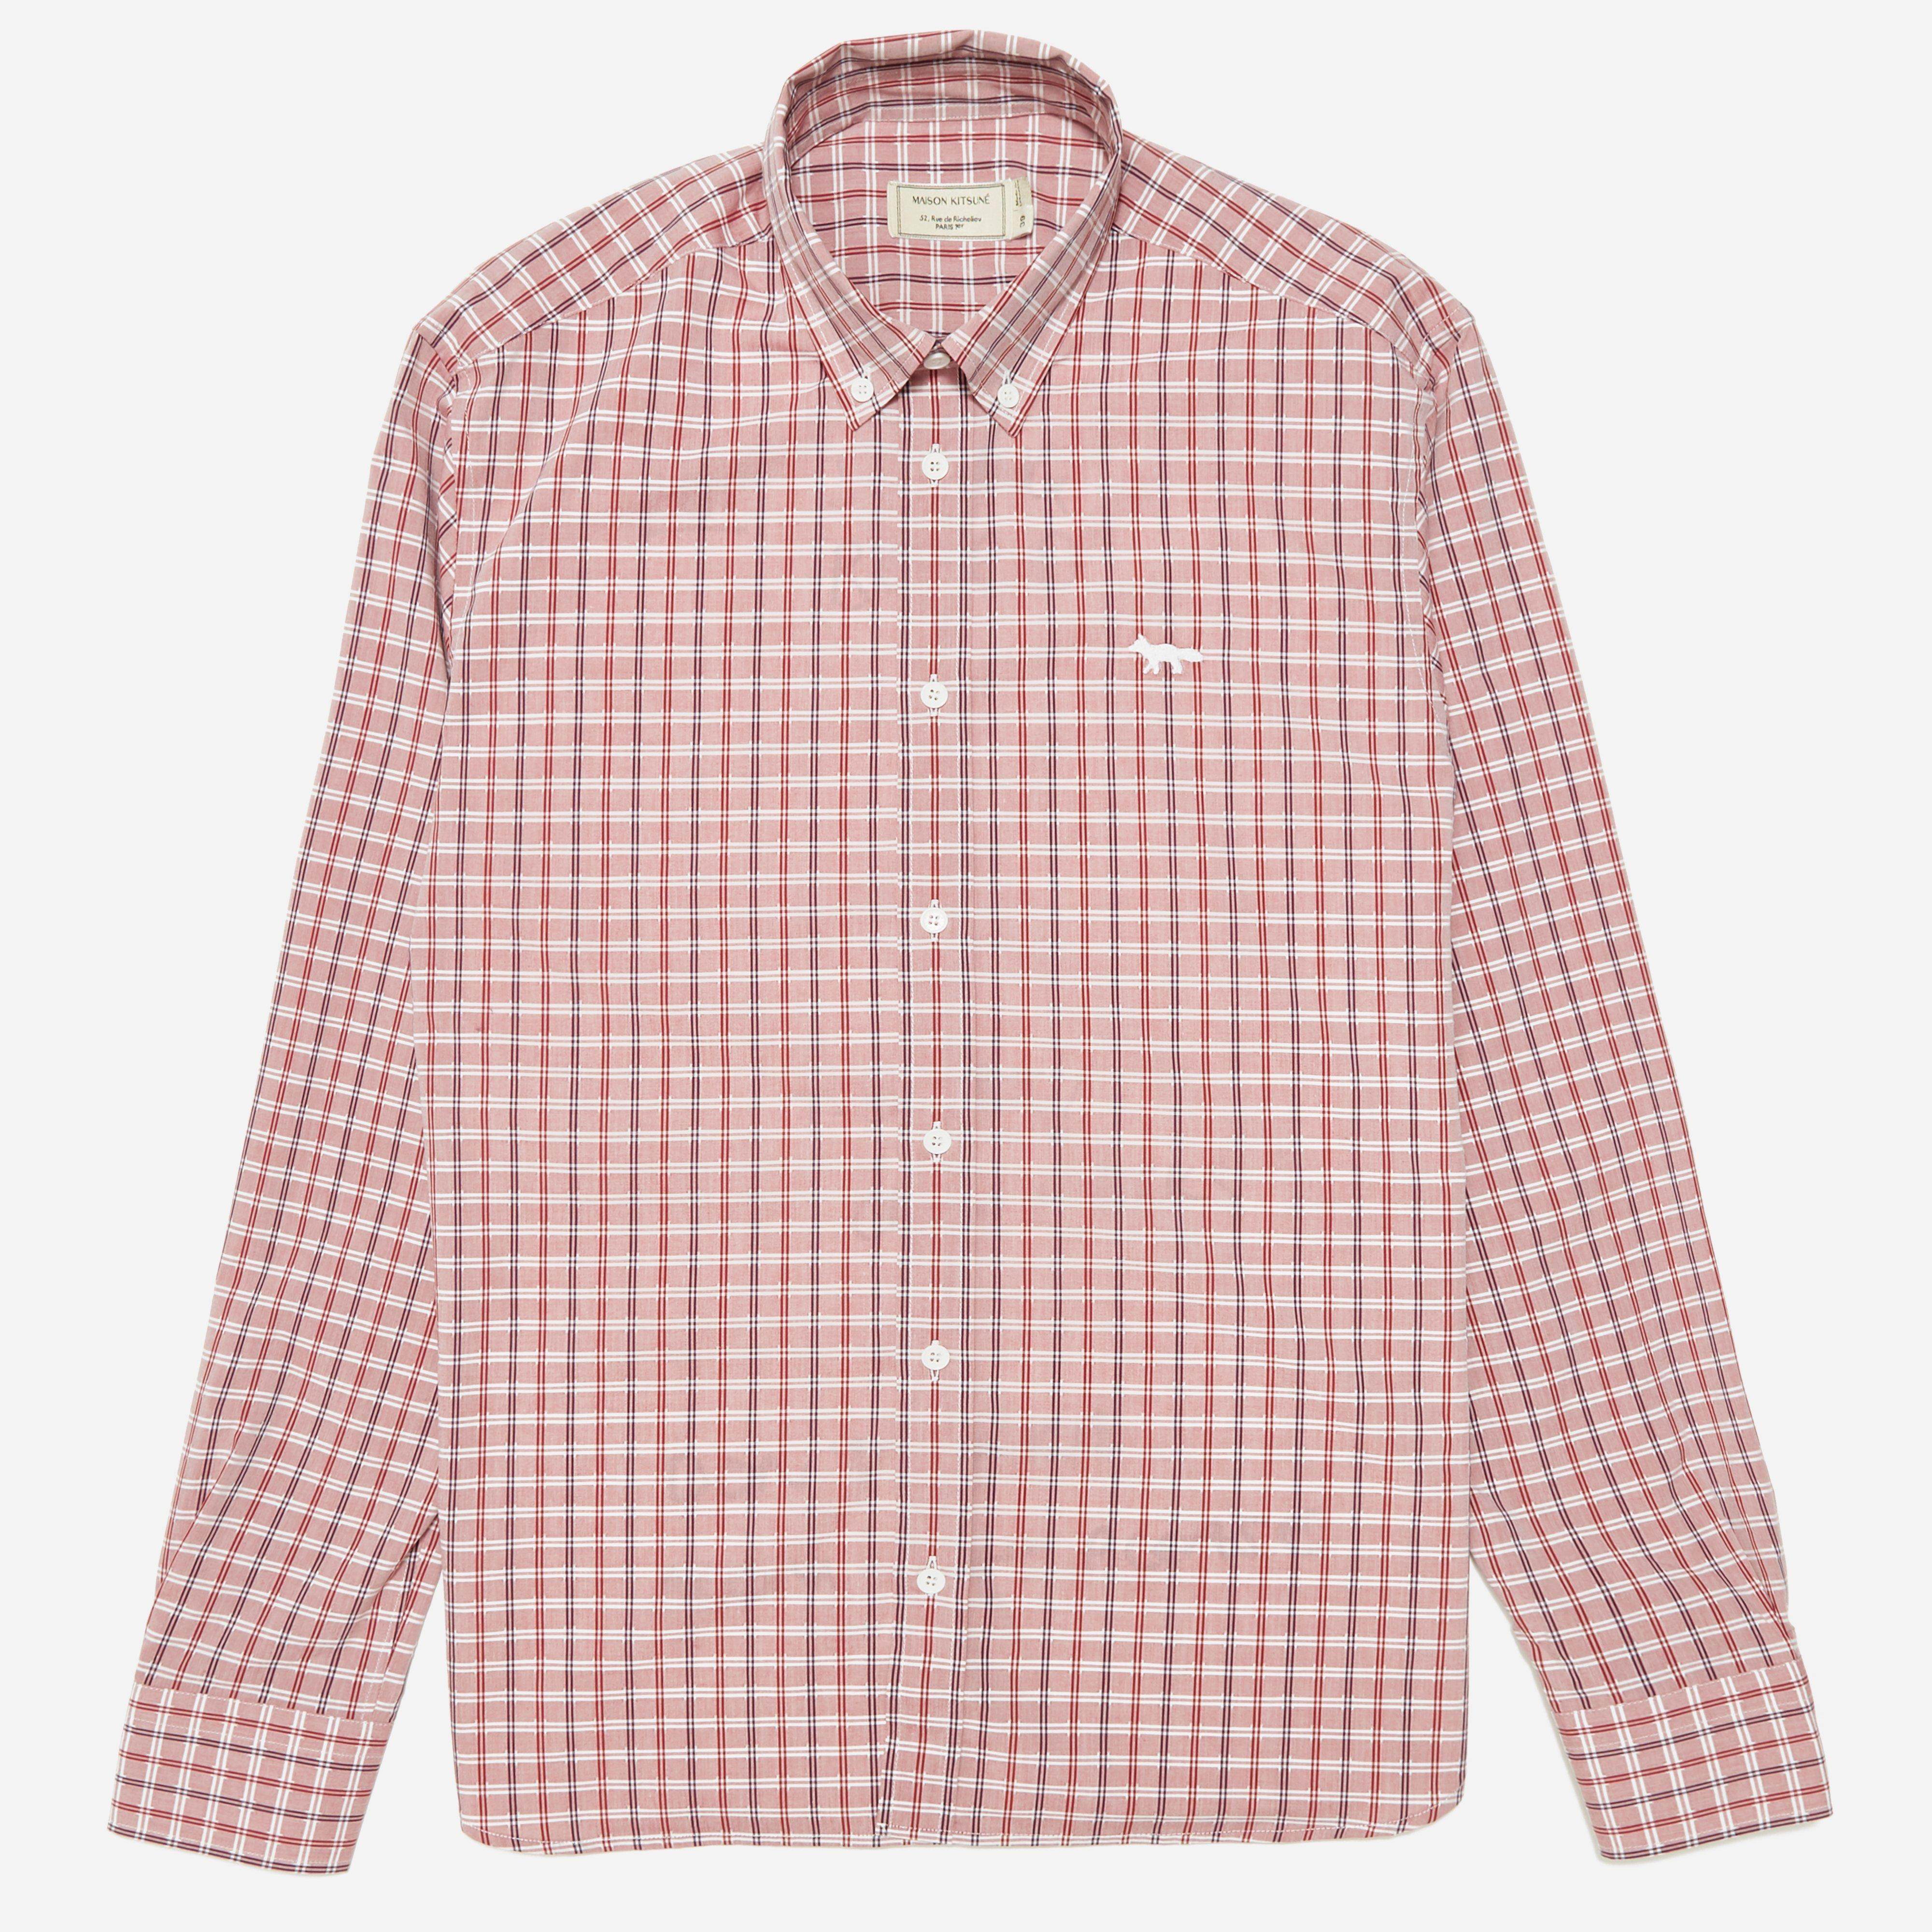 Maison Kitsune Classic Button Down Check Shirt